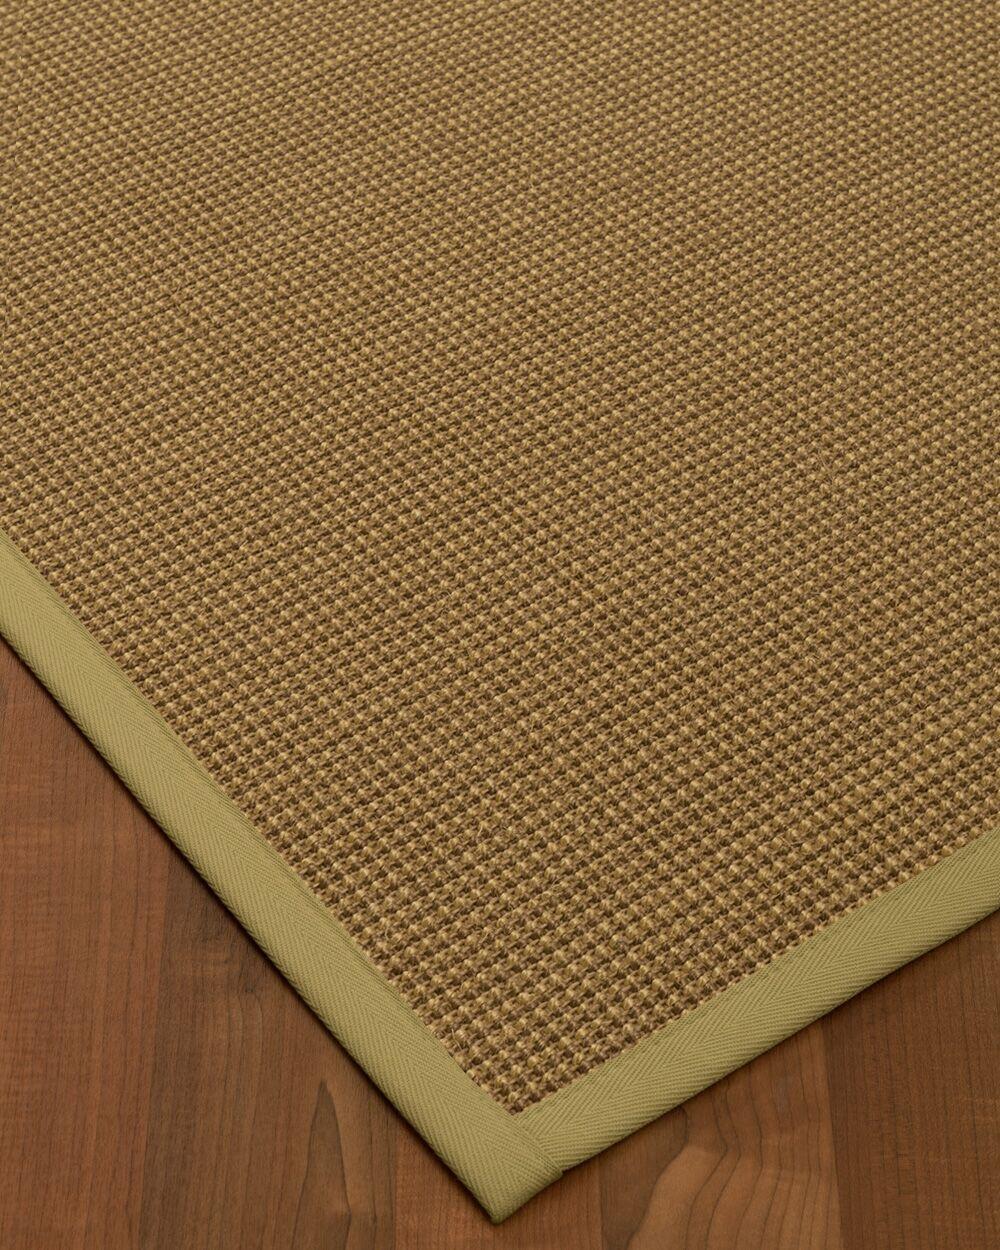 Kimmons Hand-Woven Beige Area Rug Rug Size: Rectangle 5' x 8'